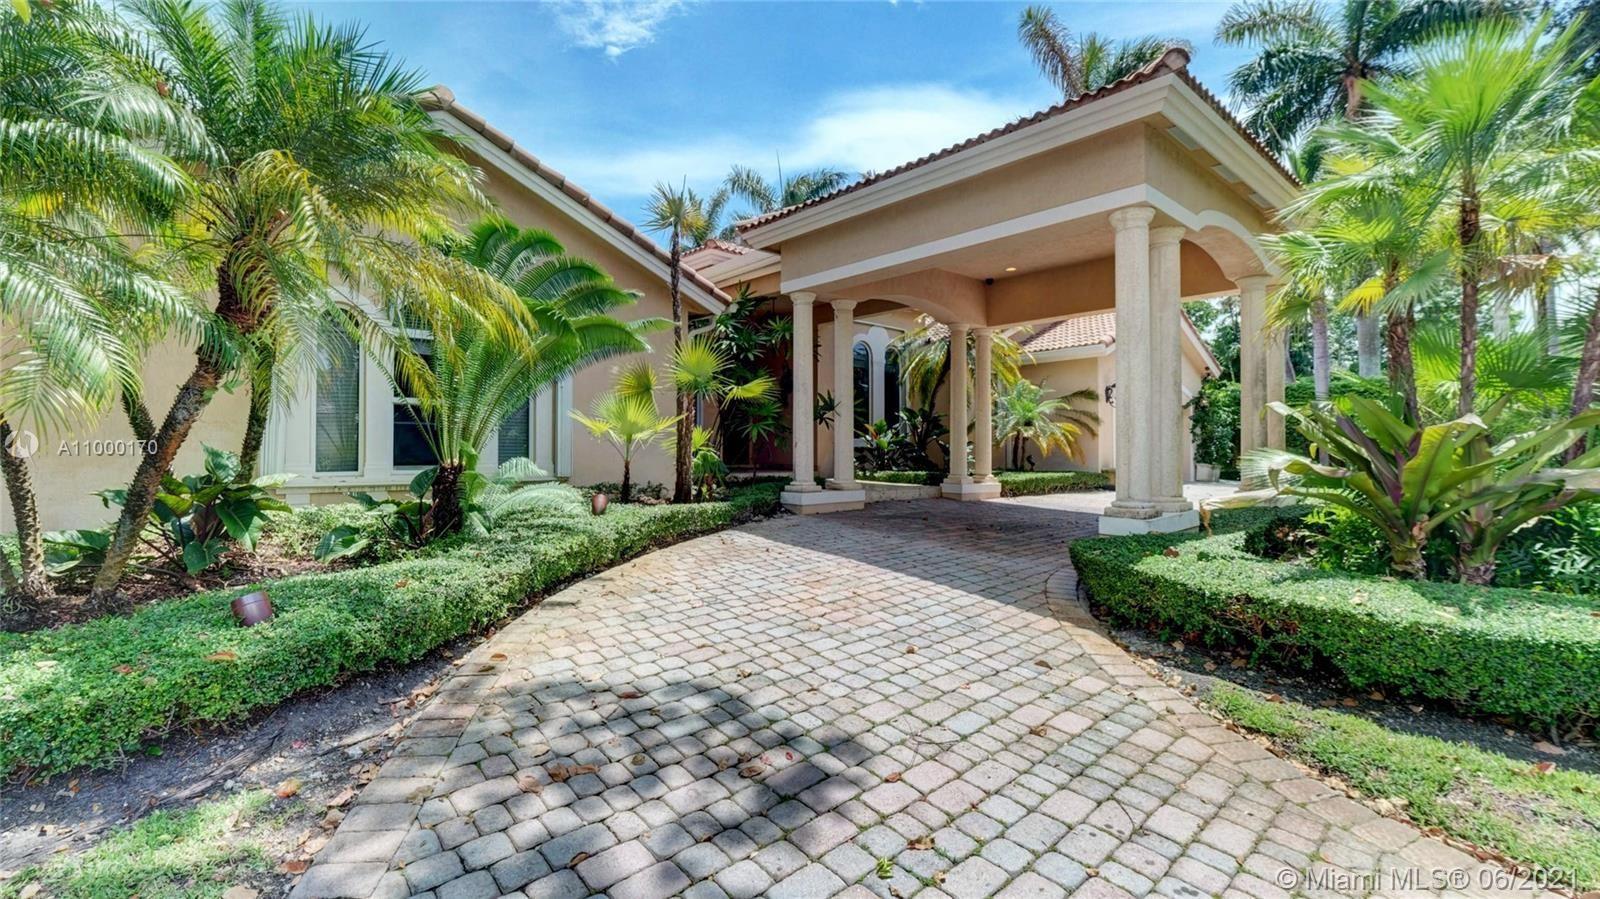 9662 SW 123rd St, Miami, FL 33176 - #: A11000170